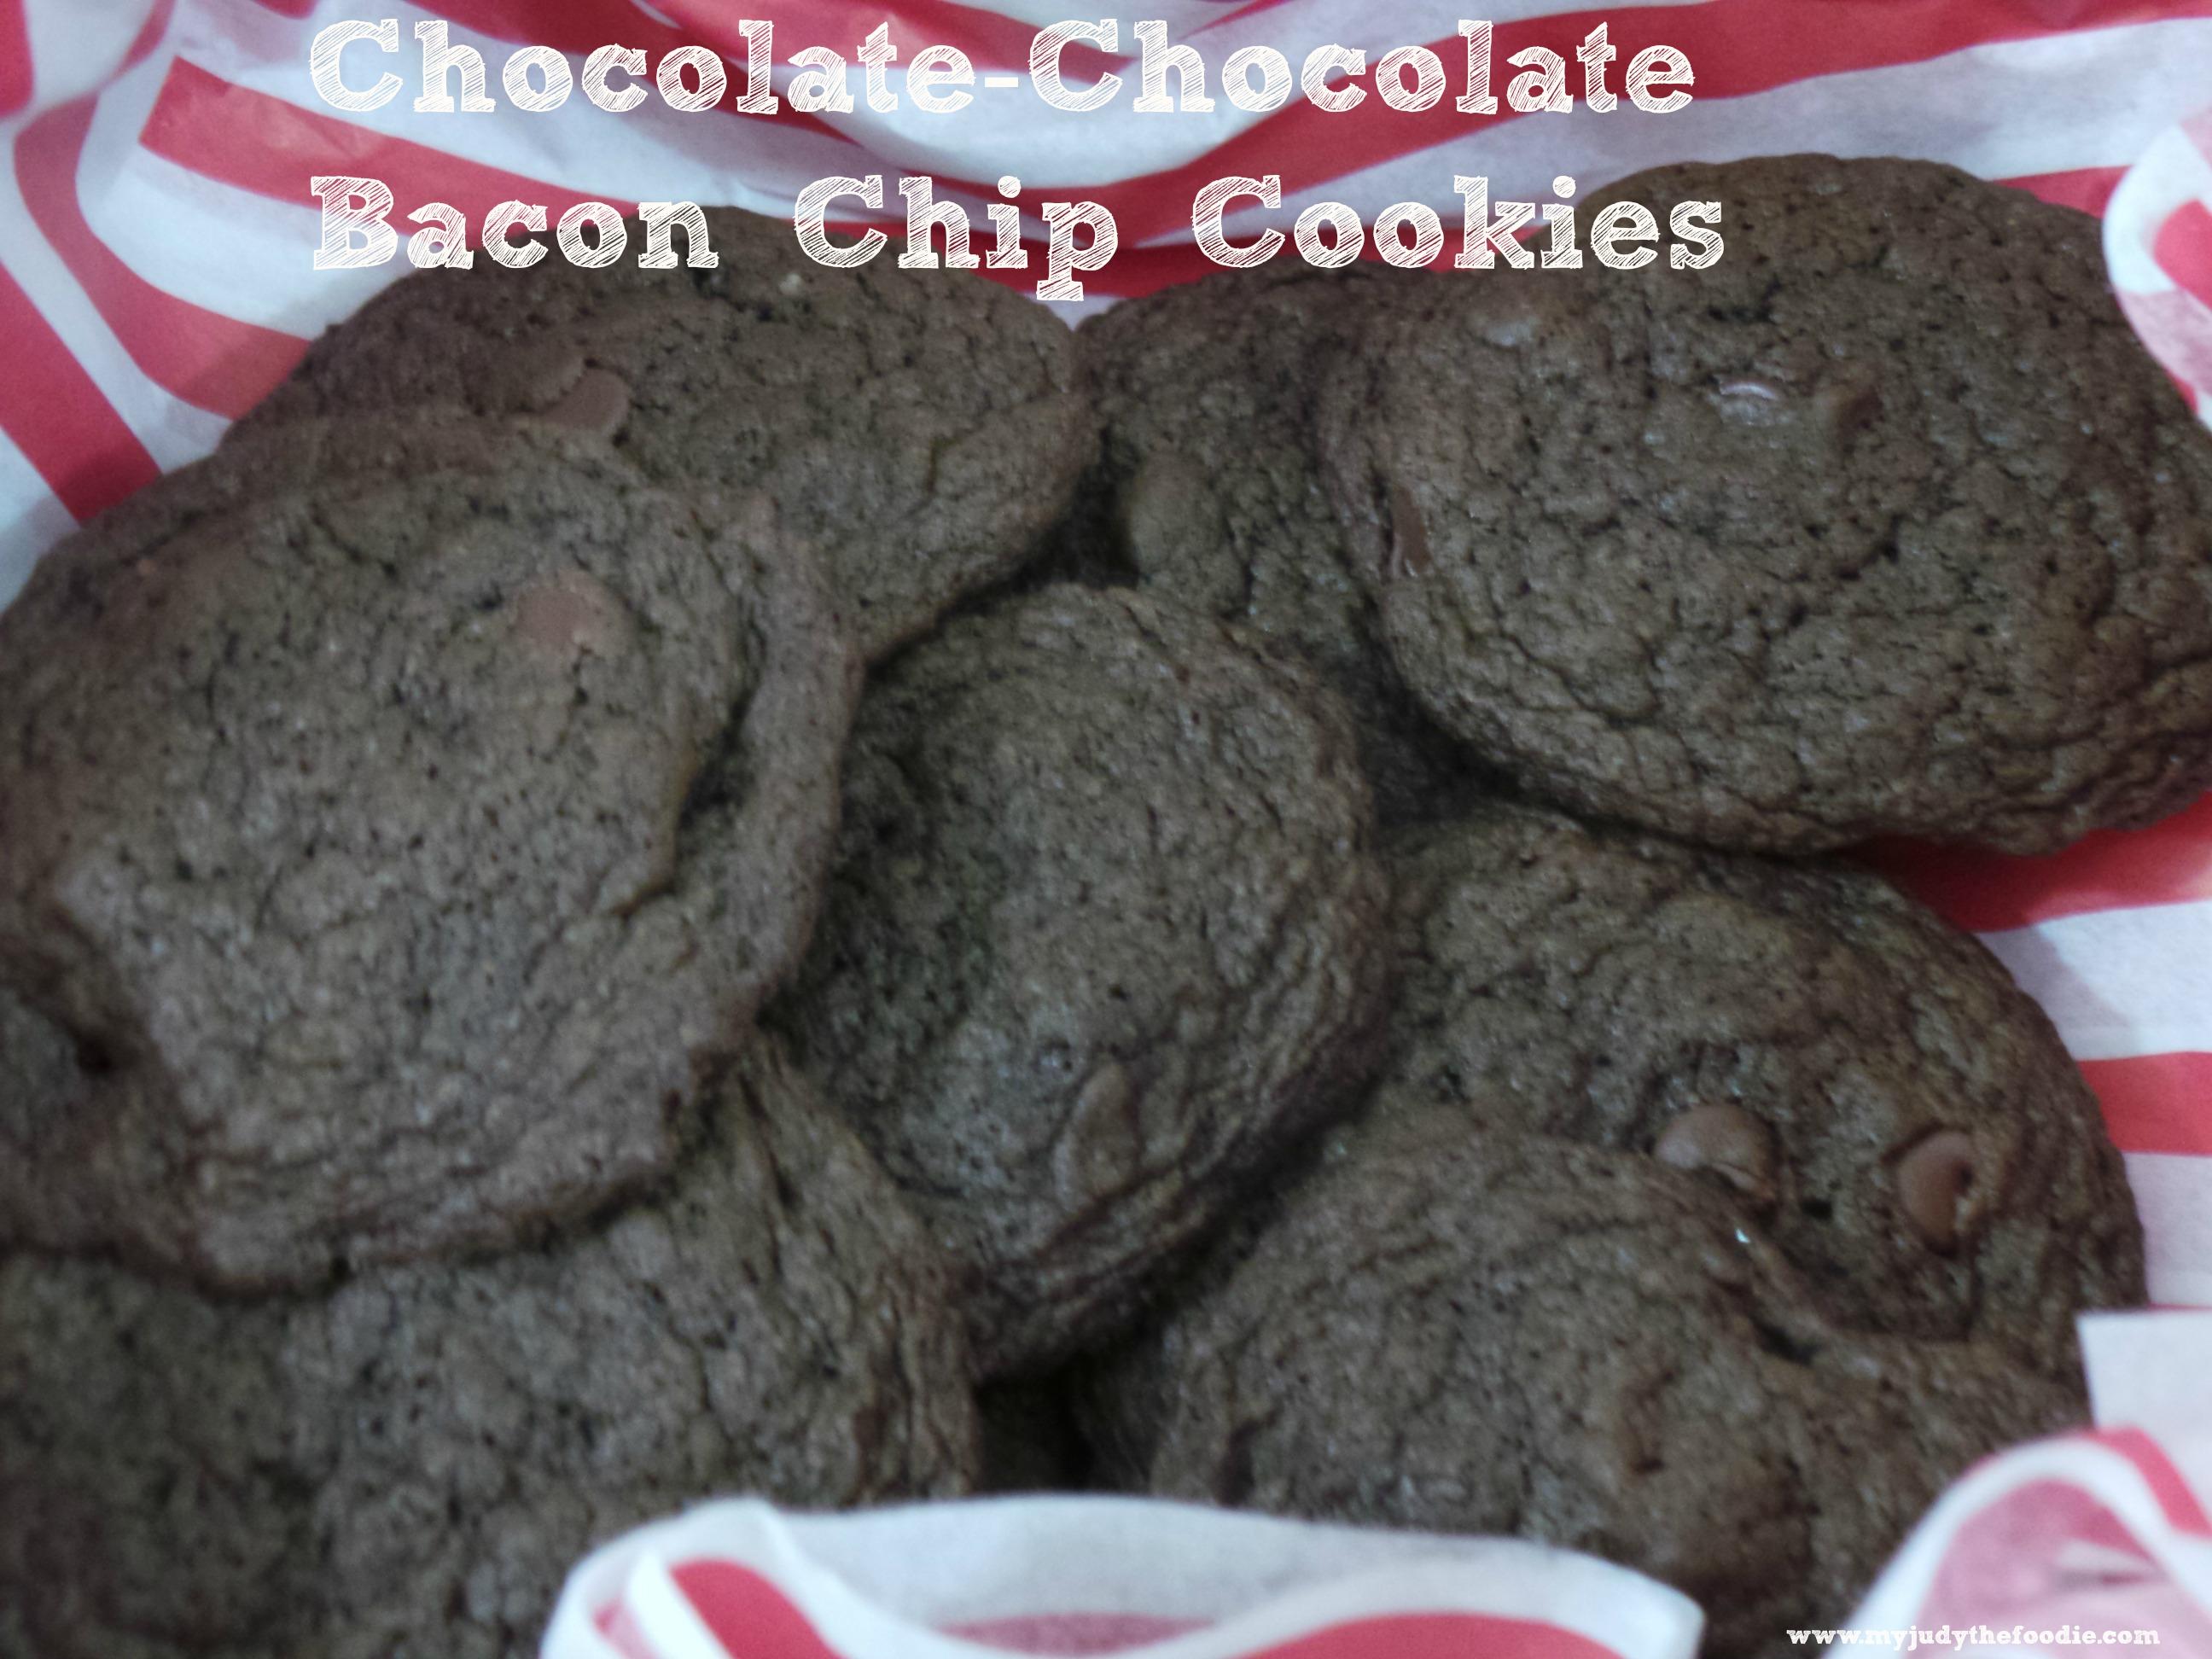 finalchocolatechocoaltechip